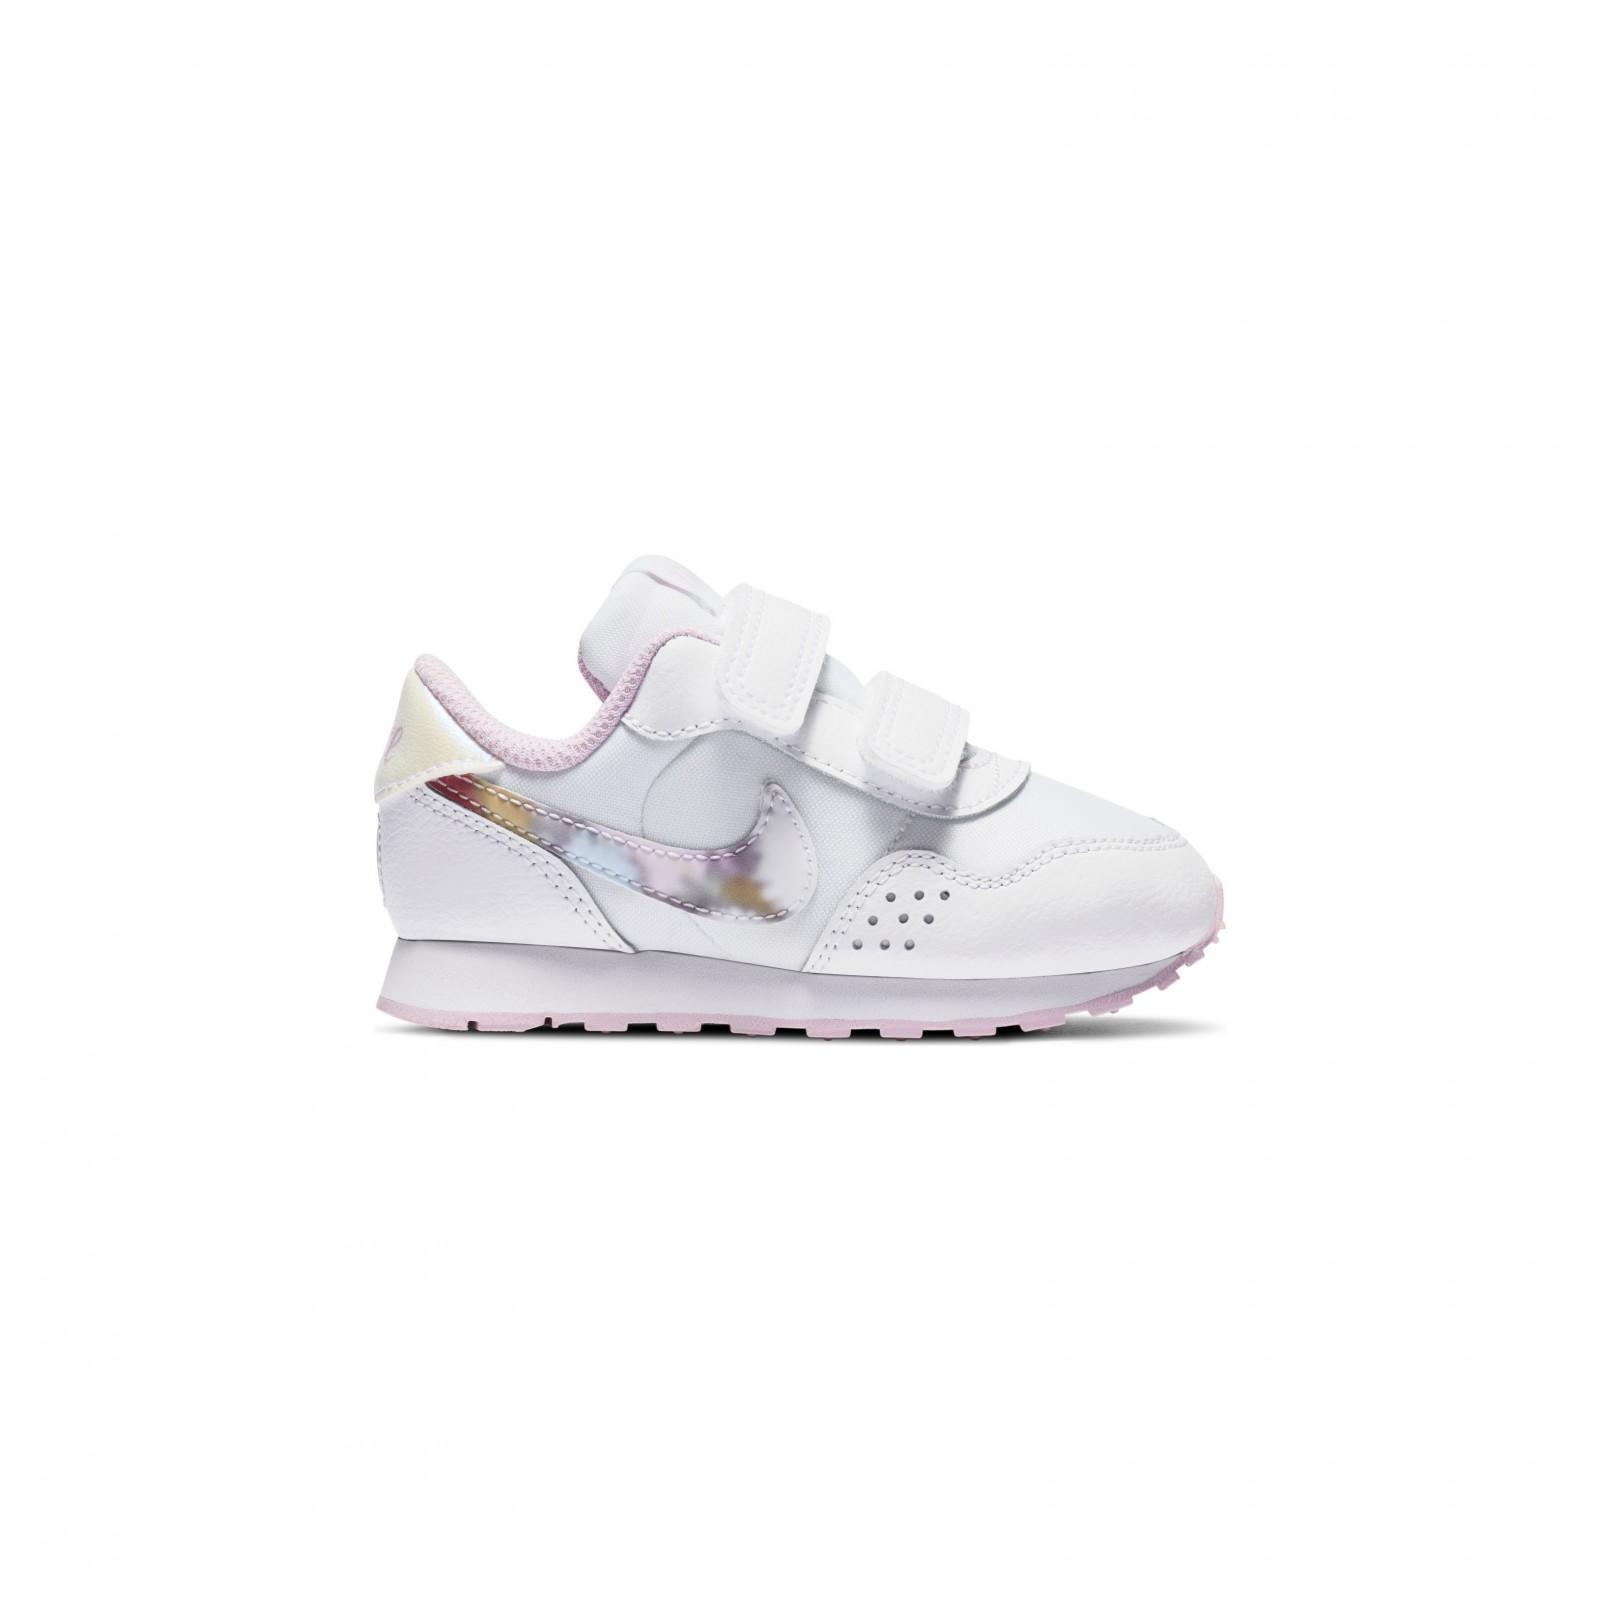 Nike md valiant flrl (tdv) WHITE/LT ARCTIC PINK-LT ARCTIC PINK